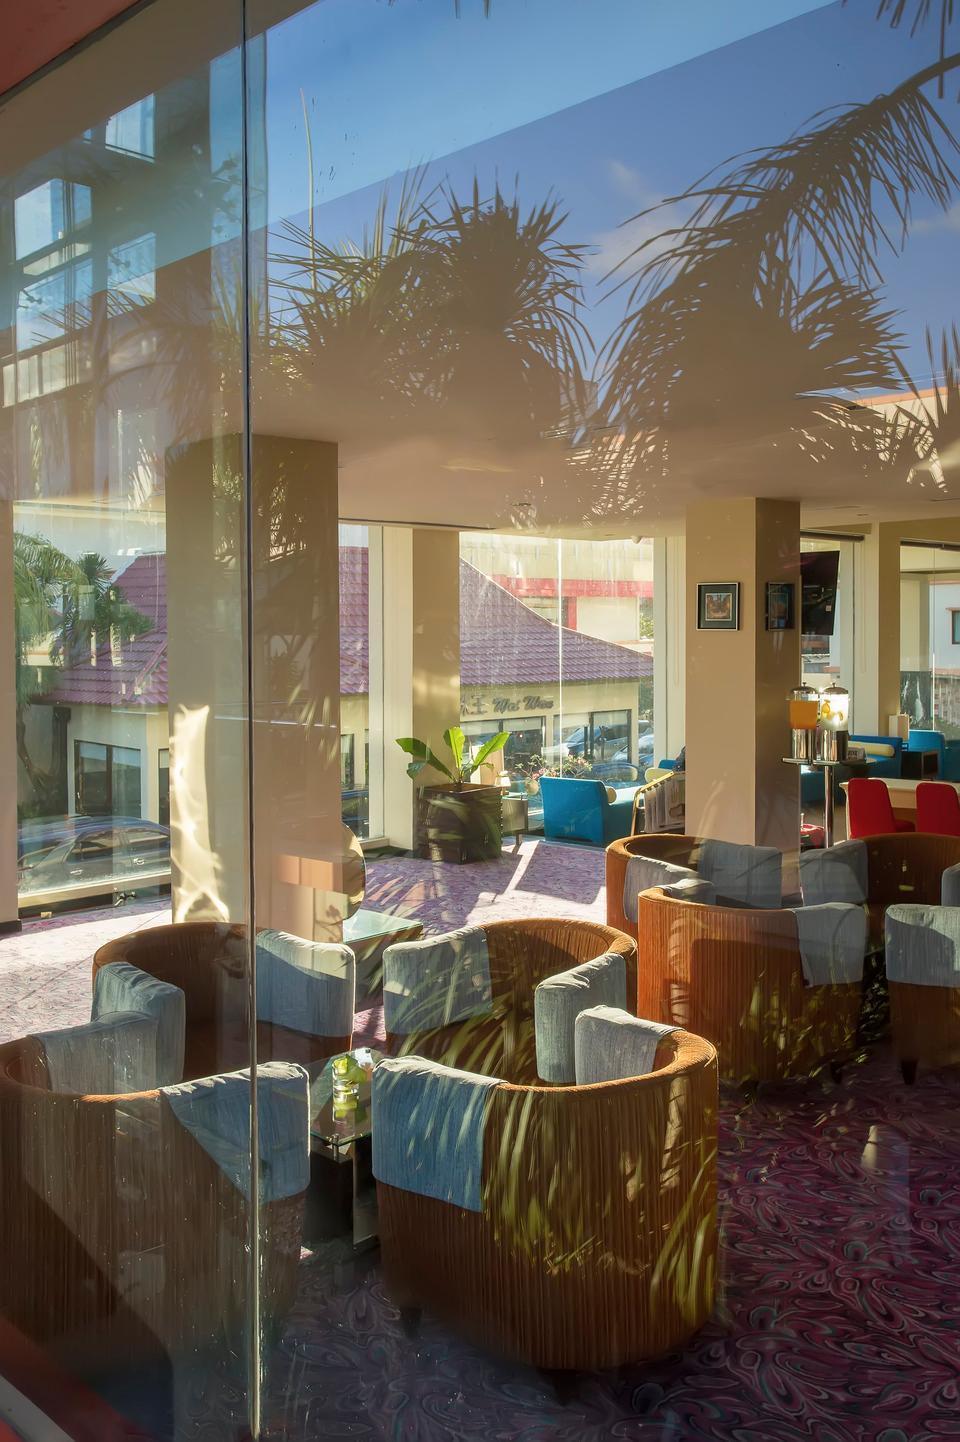 Swiss-Belhotel Silae Palu - Lobby Lounge From Outside